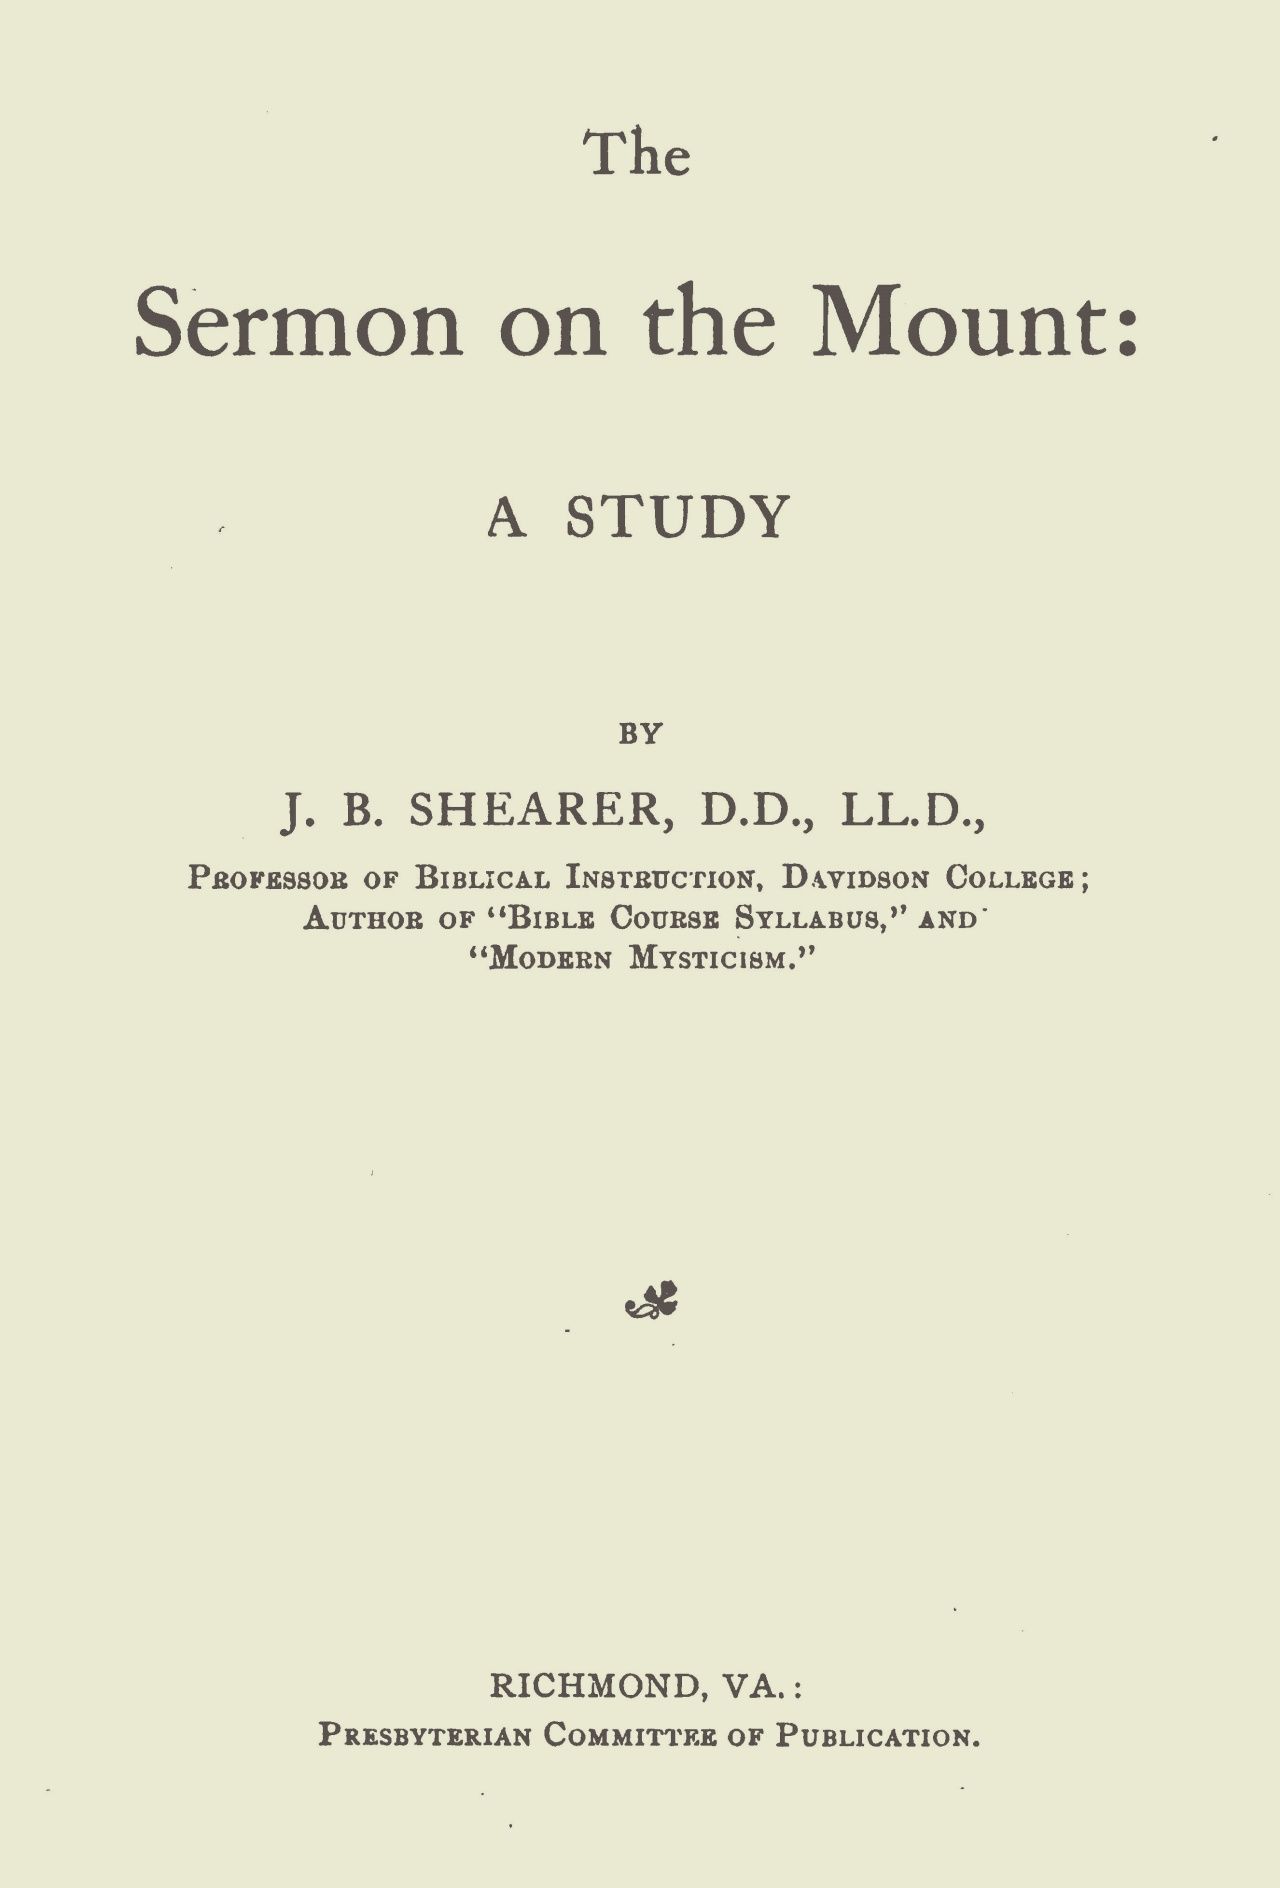 Shearer, John Bunyan, The Sermon on the Mount Title Page.jpg